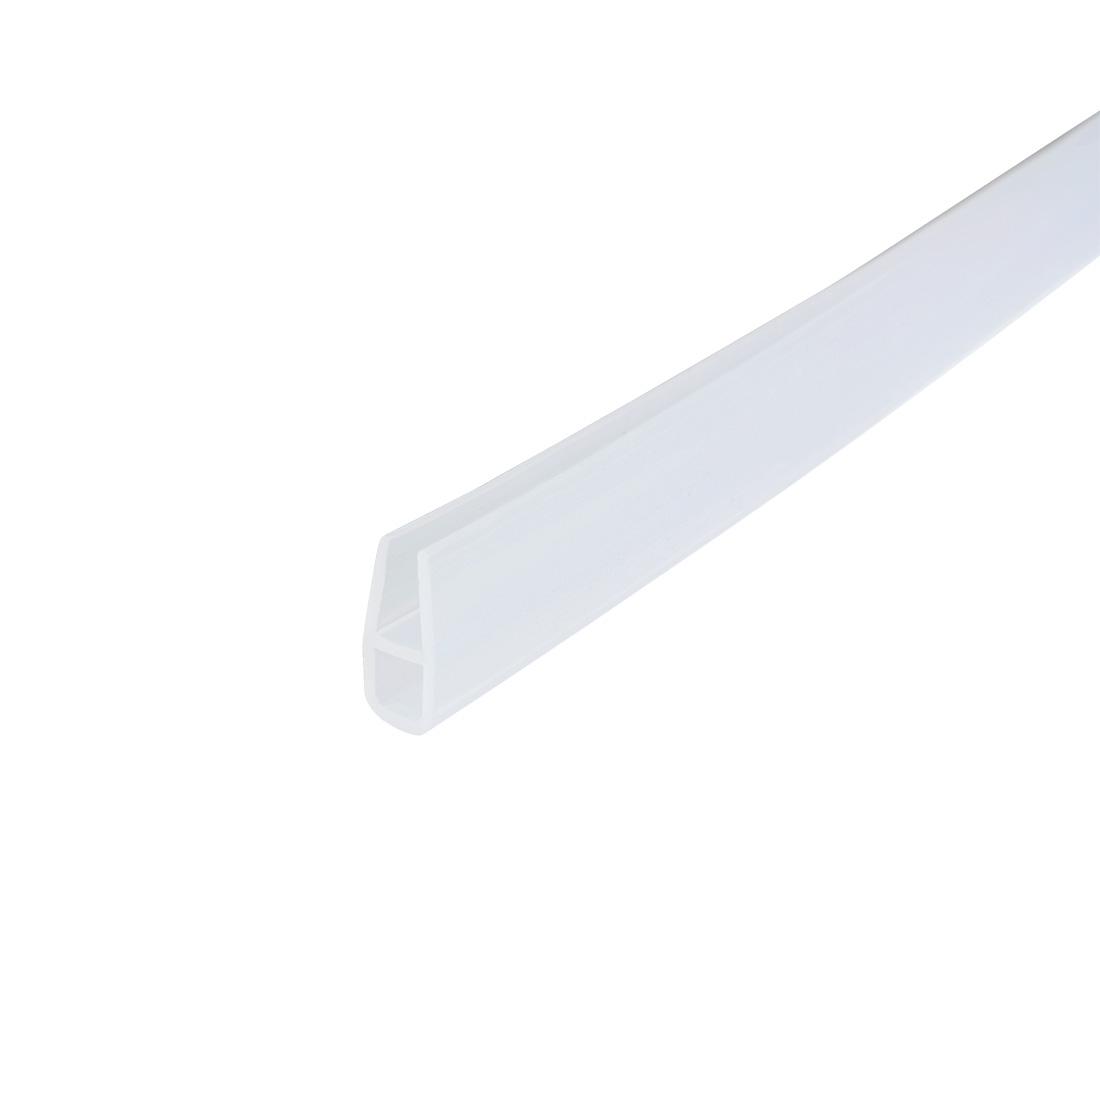 36-inch U Shaped Frameless Window Shower Door Seal Clear for 6mm Glass